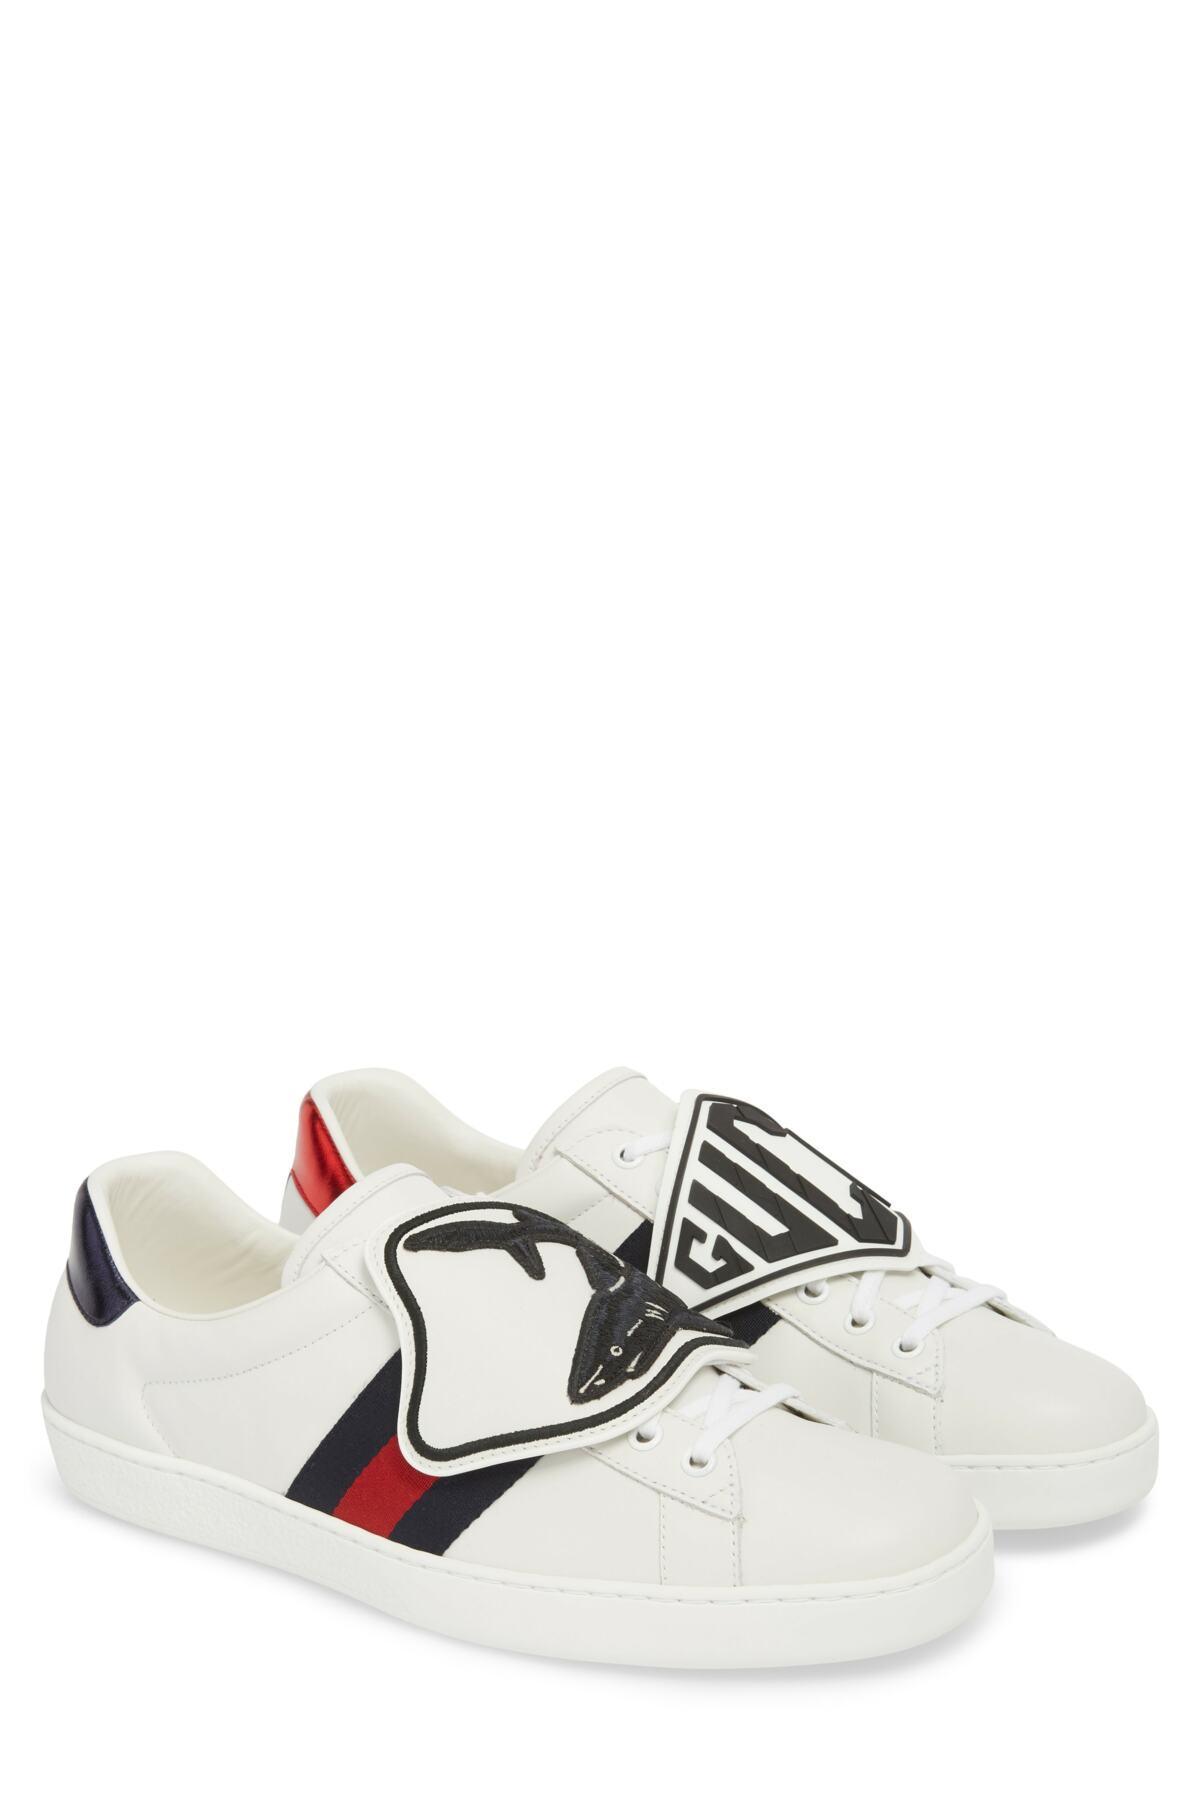 fdfb227e90d Gucci - Multicolor New Ace Patch Sneaker for Men - Lyst. View fullscreen